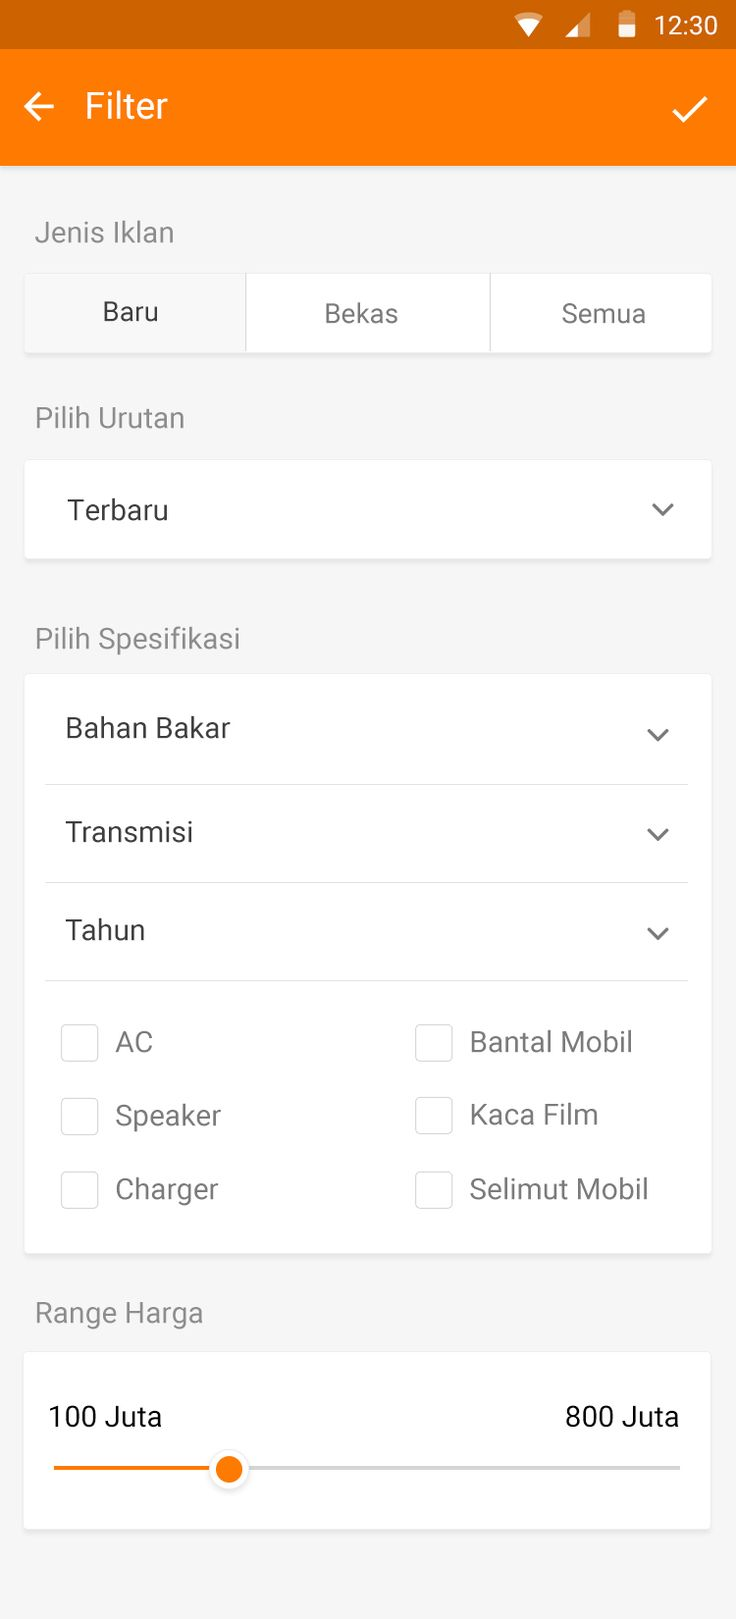 Android kategori filter